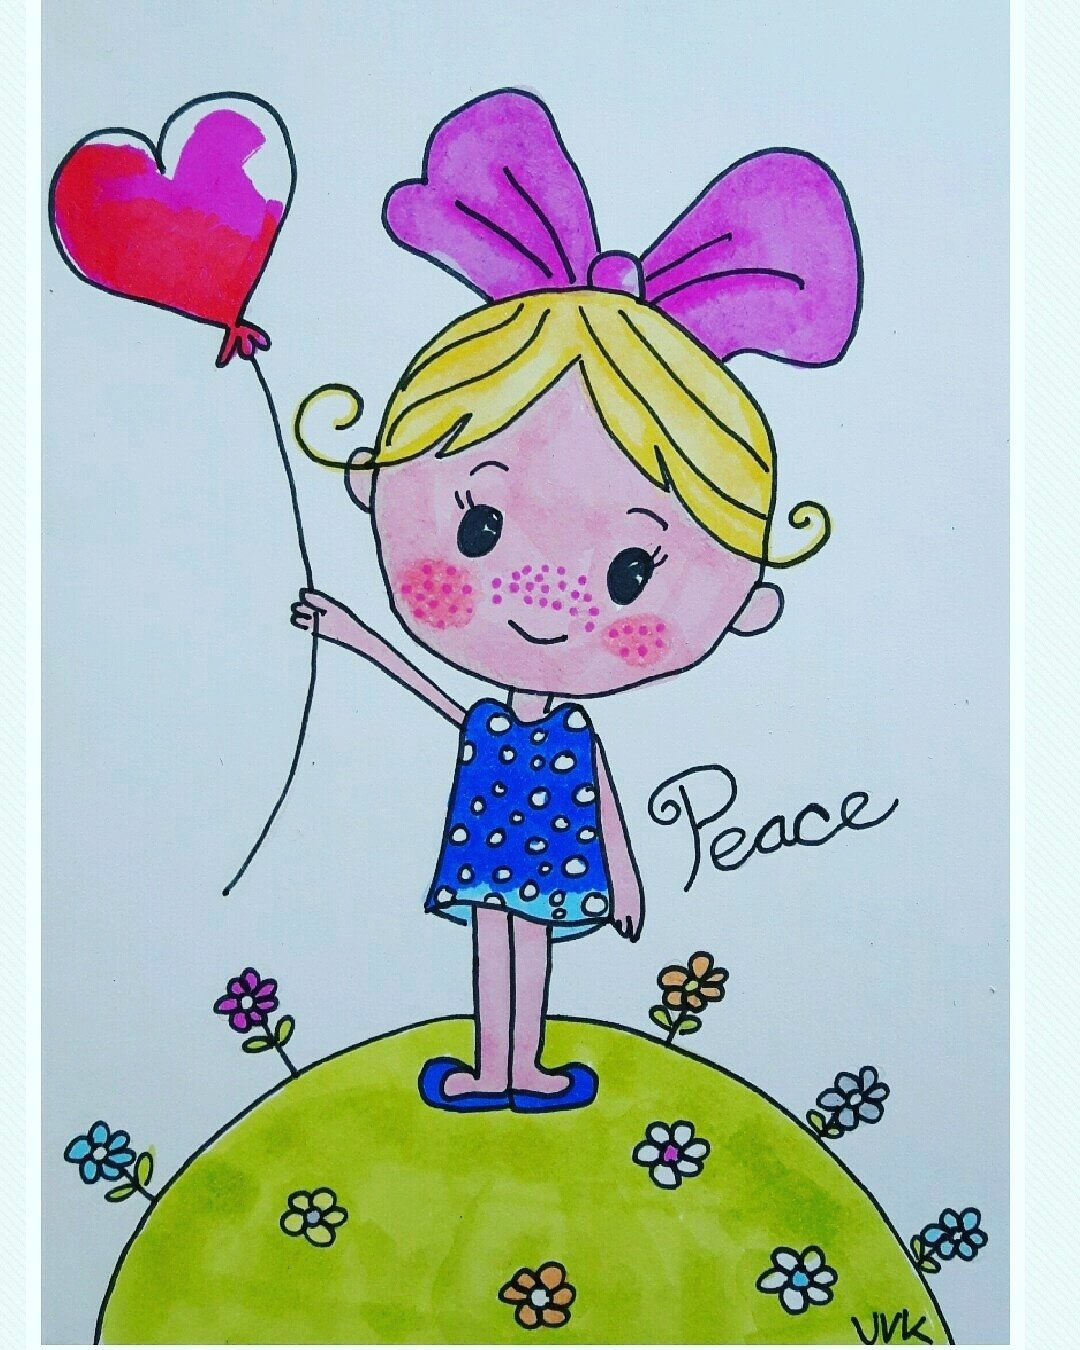 Vrede Vredeskind Meisje Met Strik Peace Sweet Girl With Heart Balloon Design A Second Life The Netherlands Ballonnen Vrede Grappige Teksten